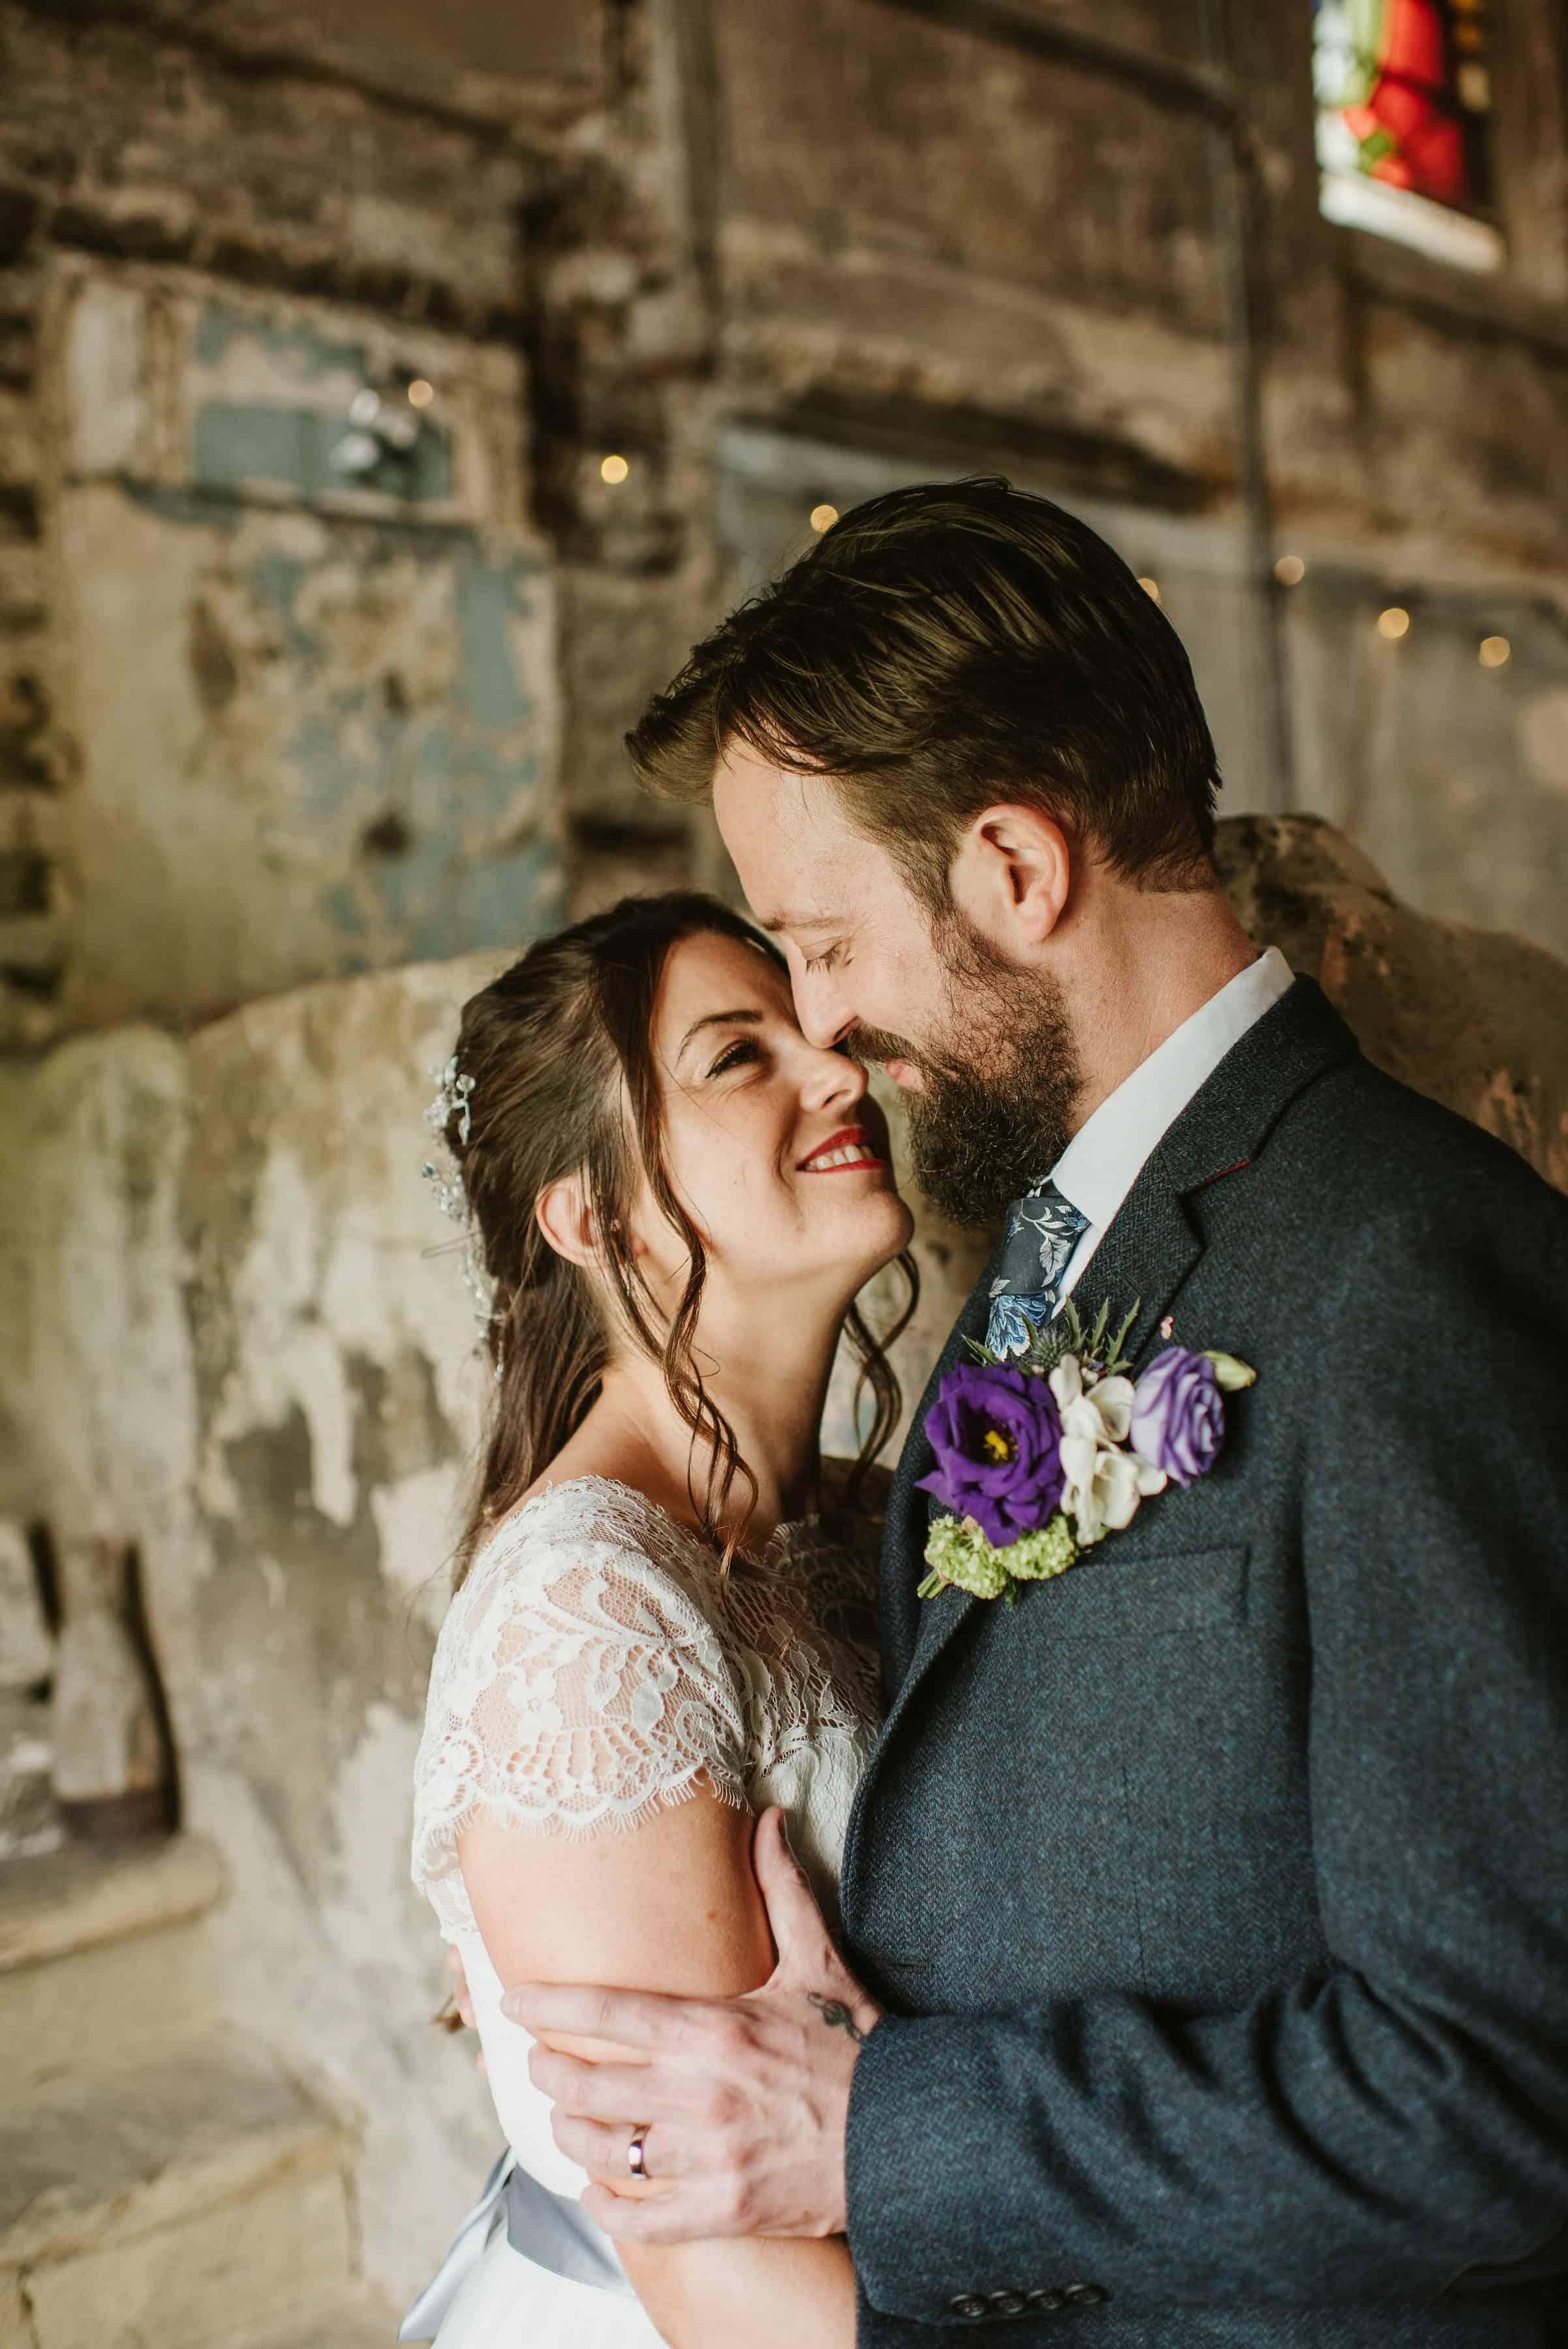 Asylum wedding photography portrait